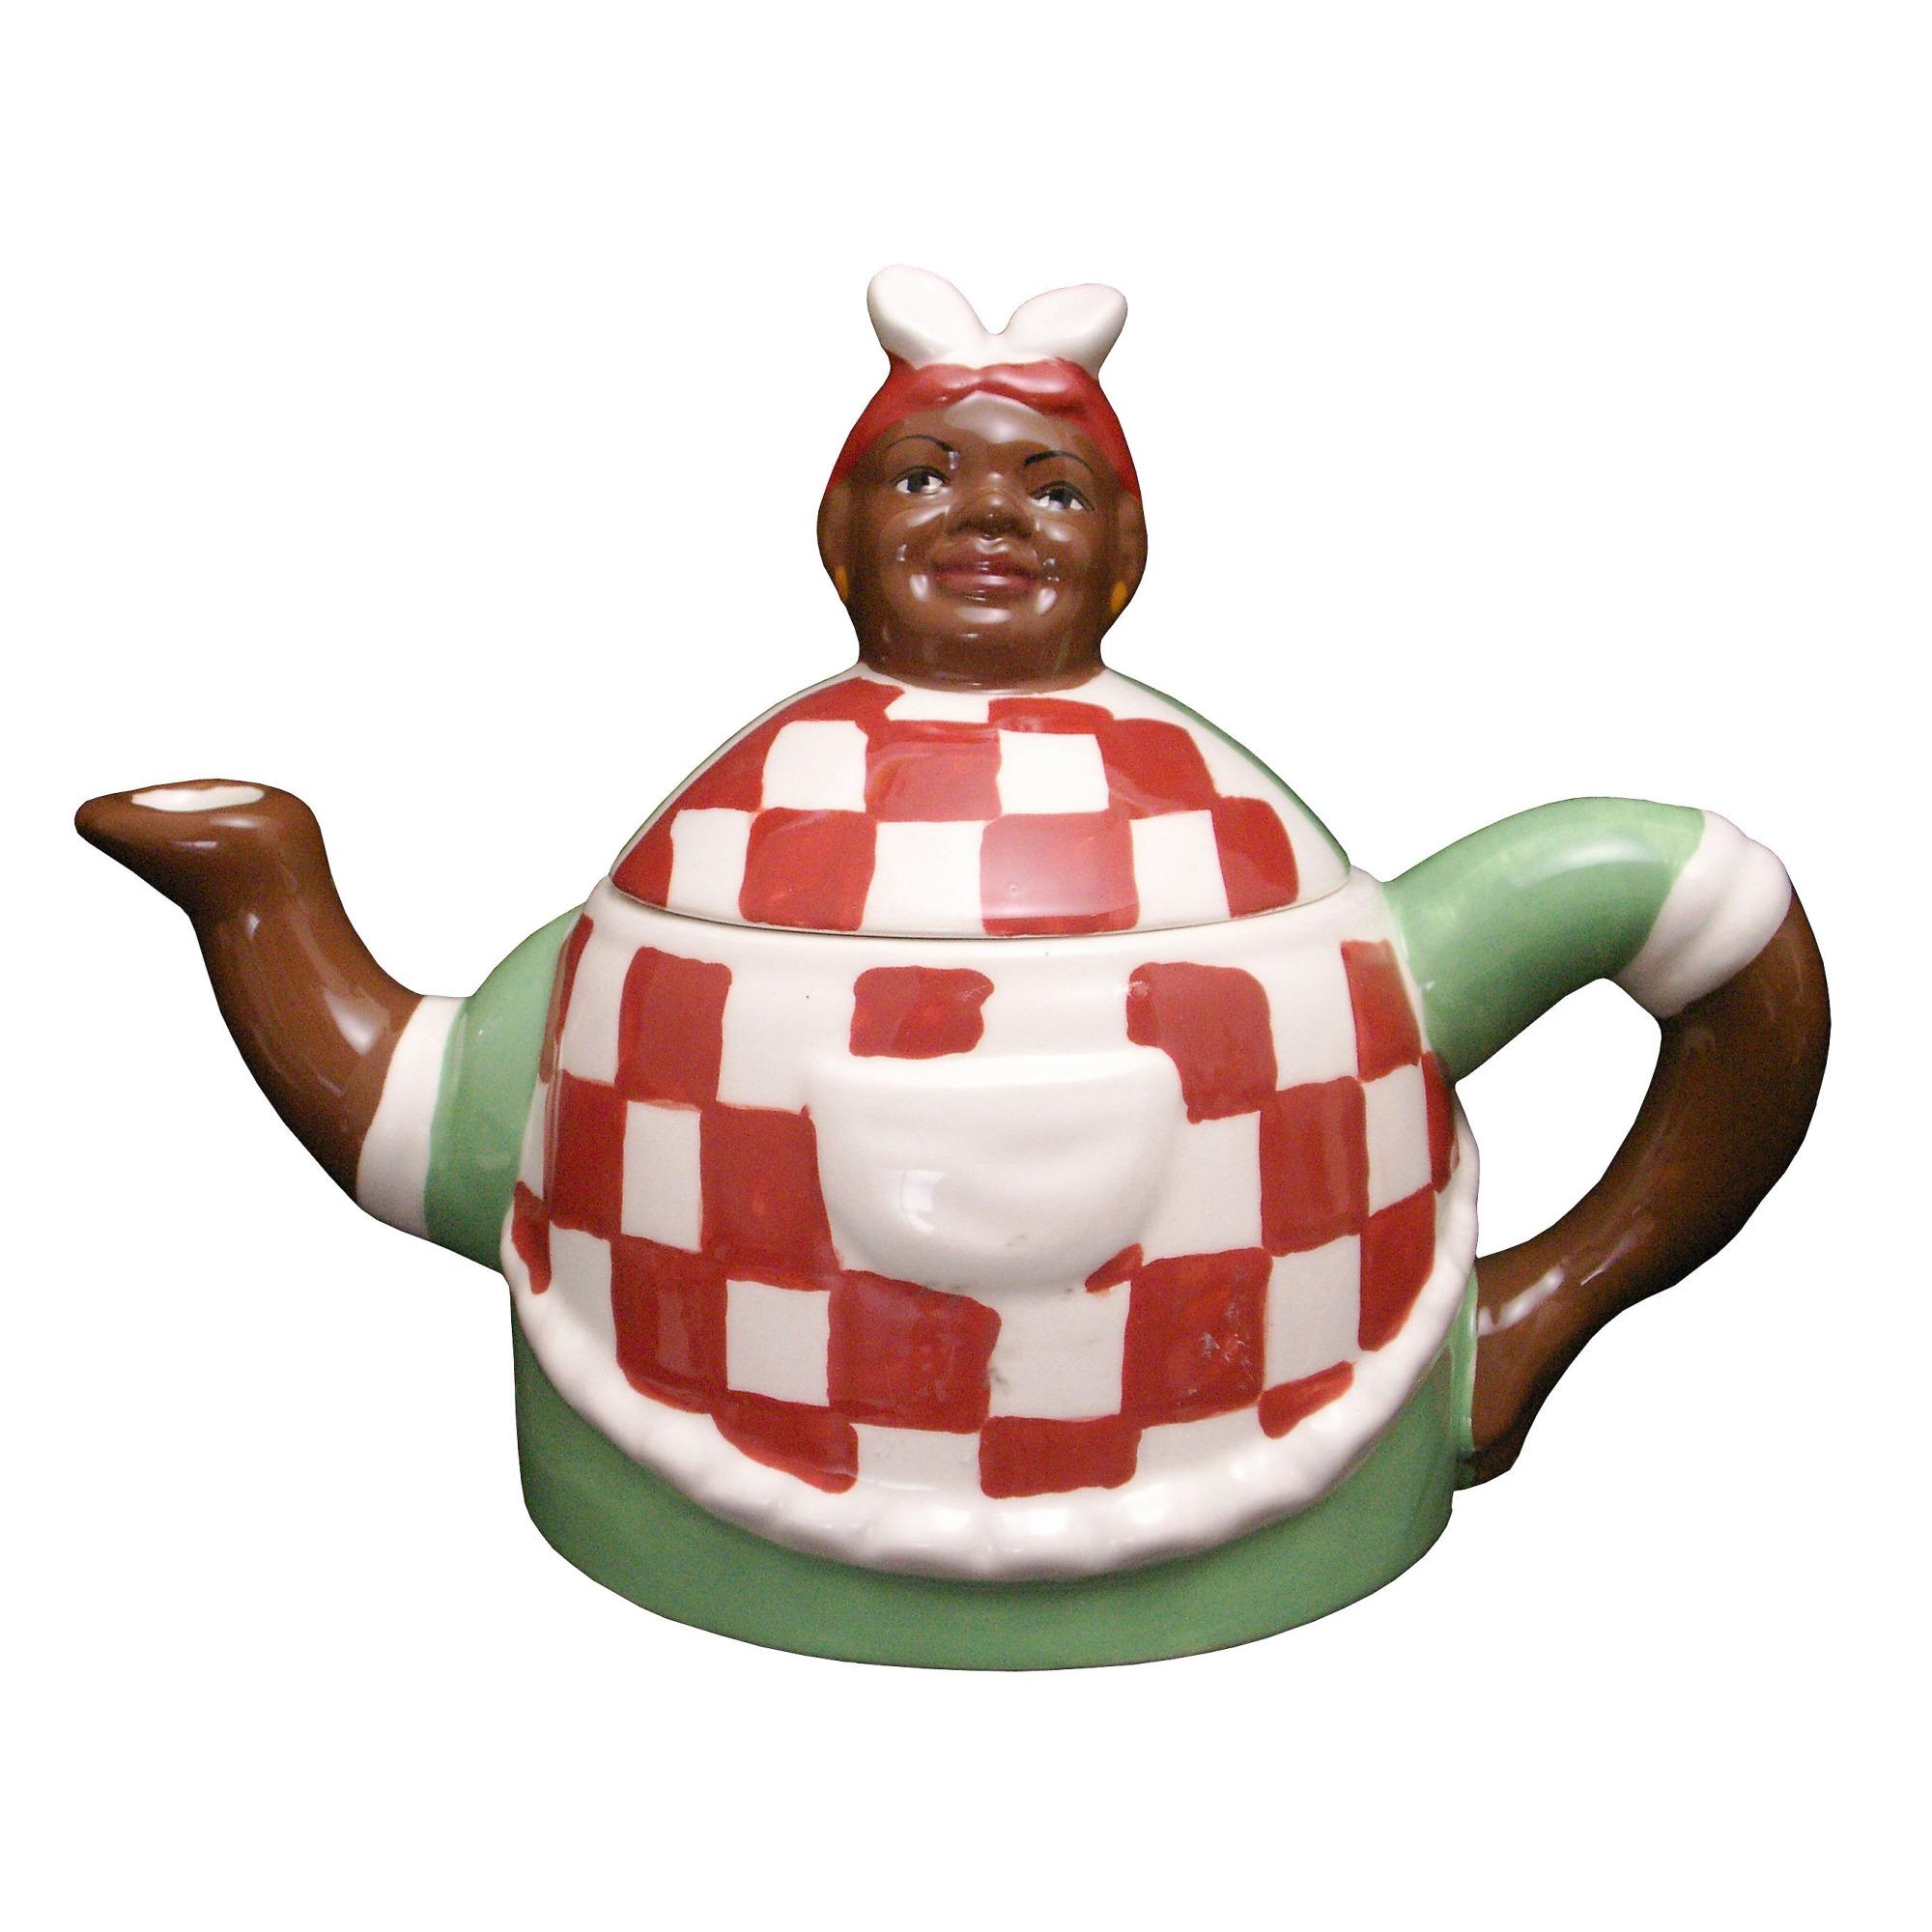 Teapot Aunt Jemima Kitchen Decor (Image 9 of 10)